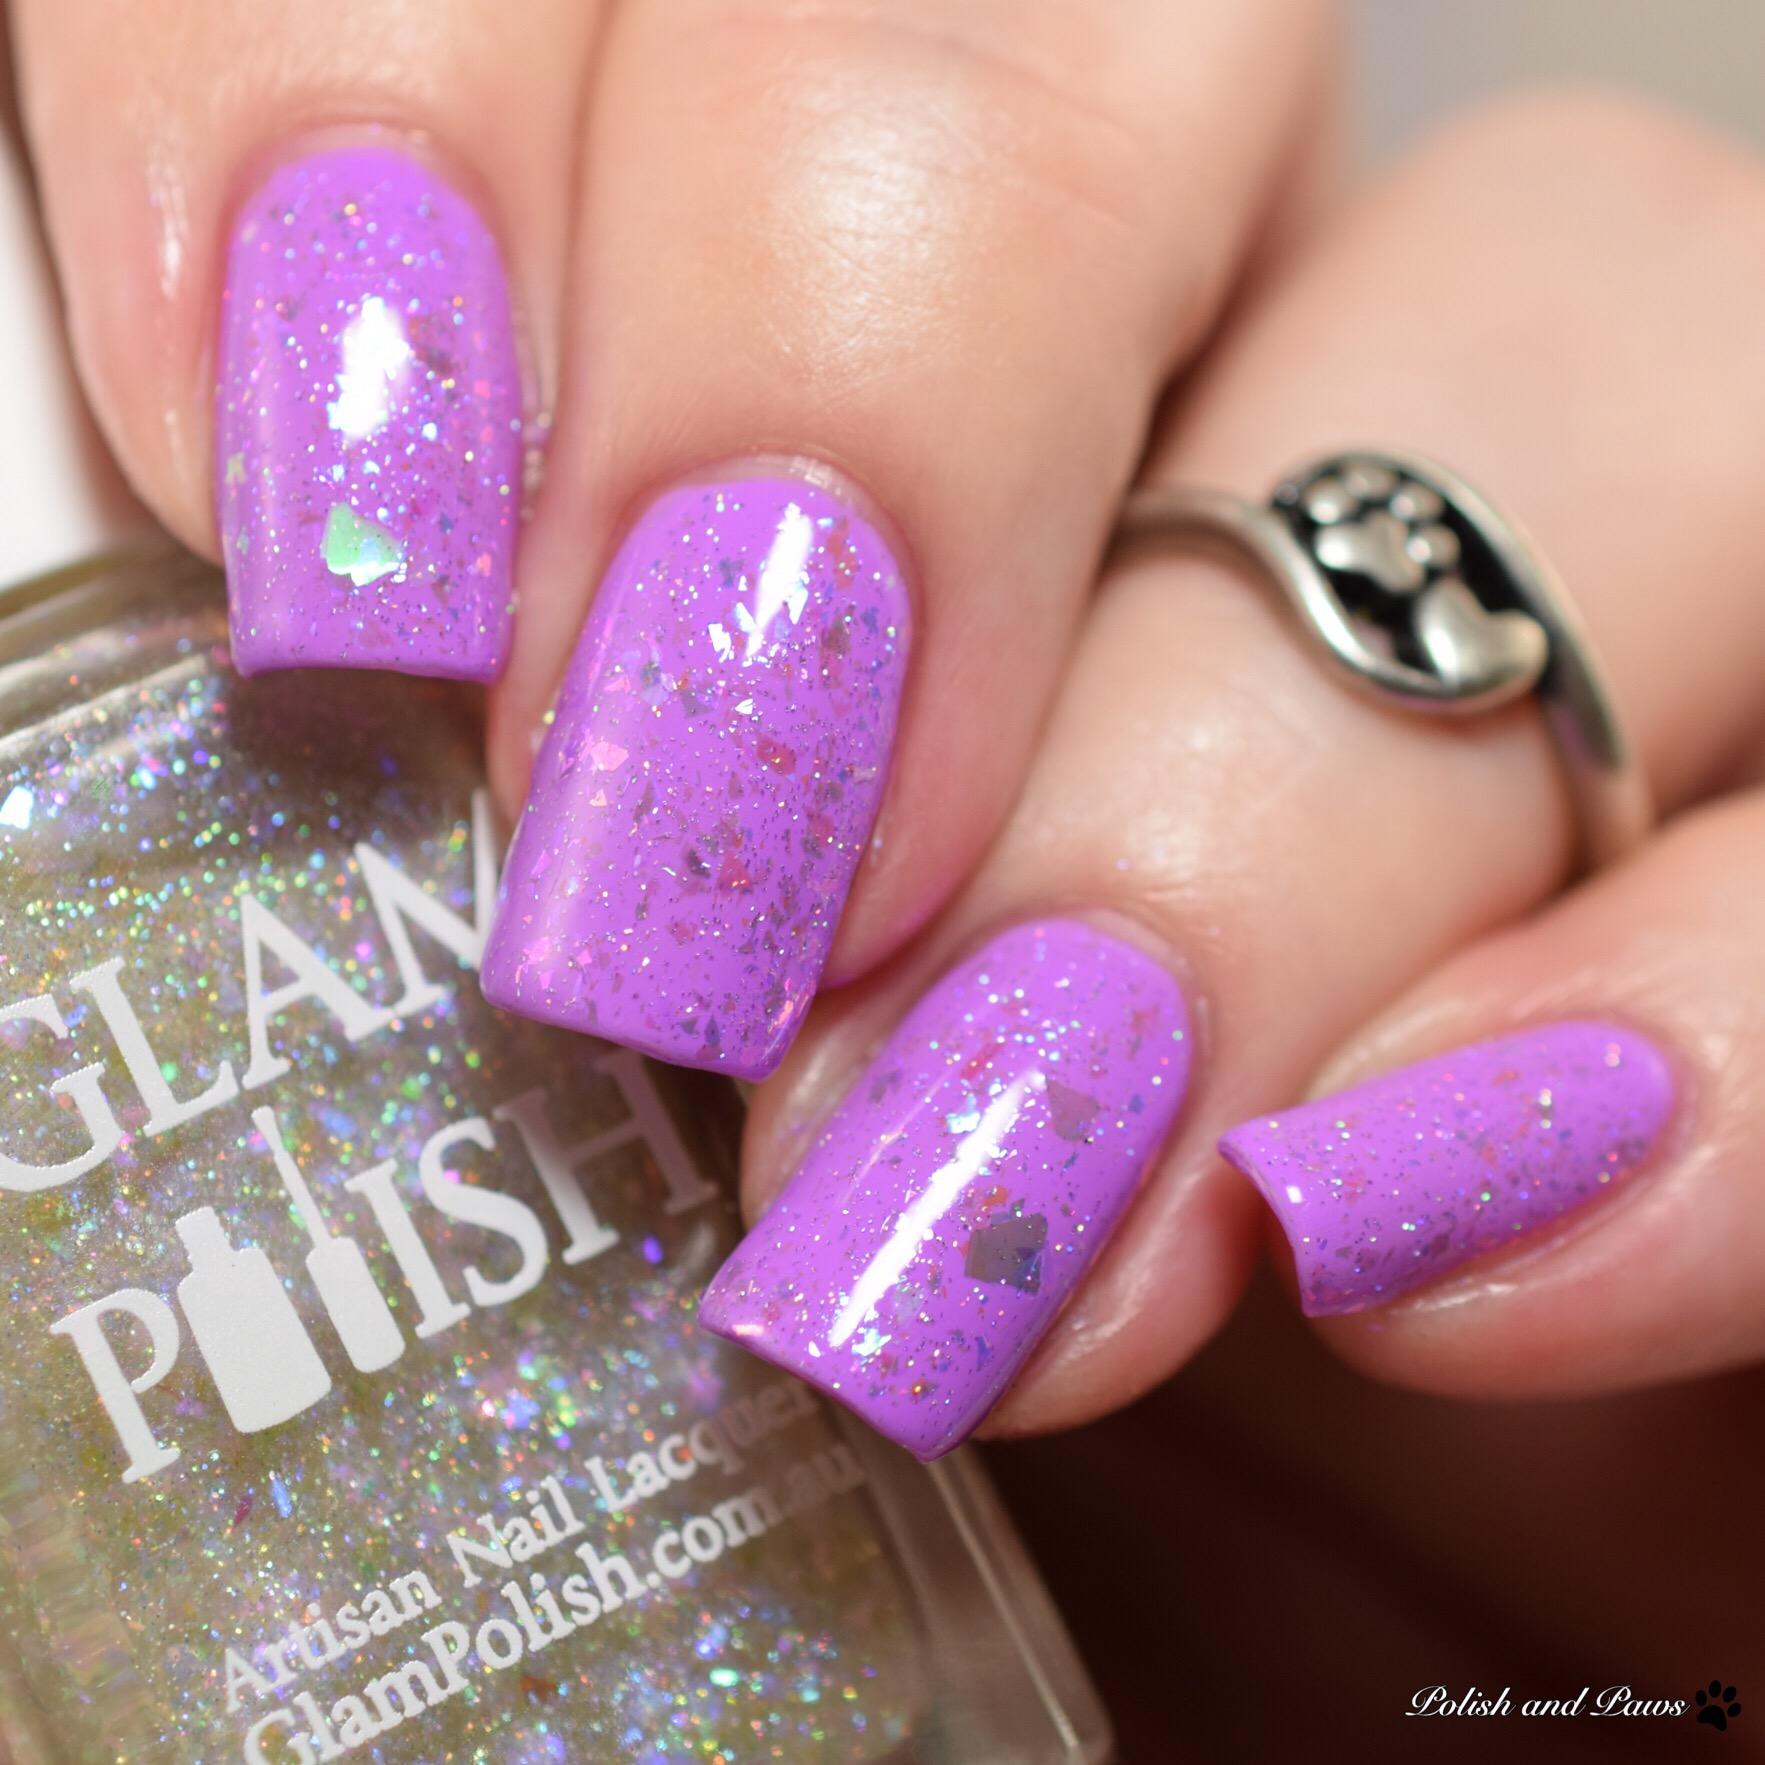 Glam Polish Secrets in the Sand